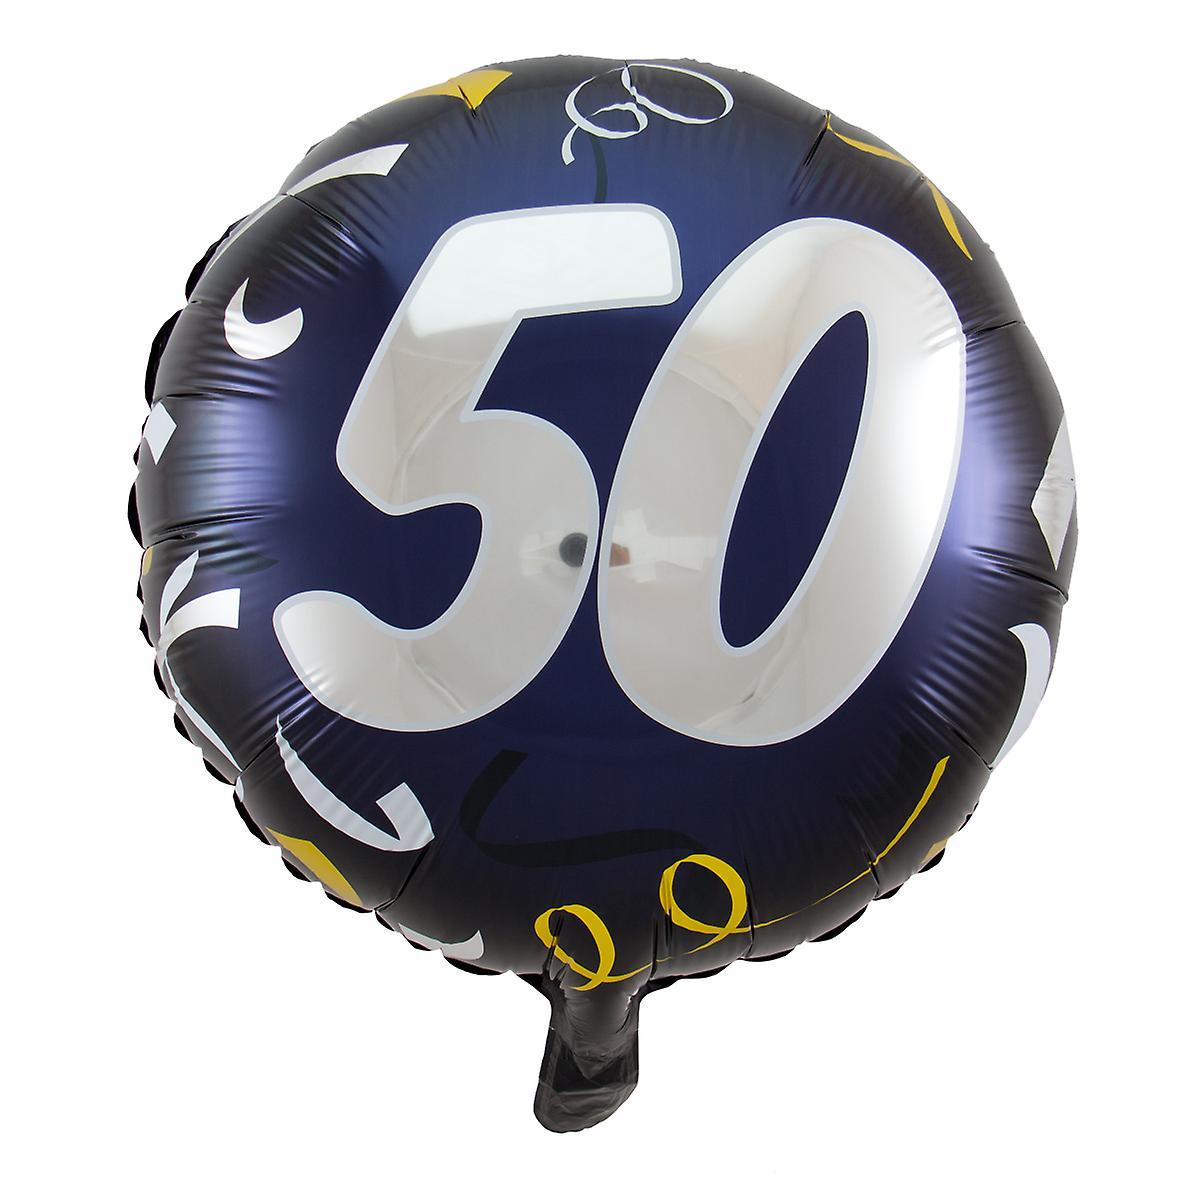 Folienballon Geburtstag Zahl 50 Ehrentag circa 45cm